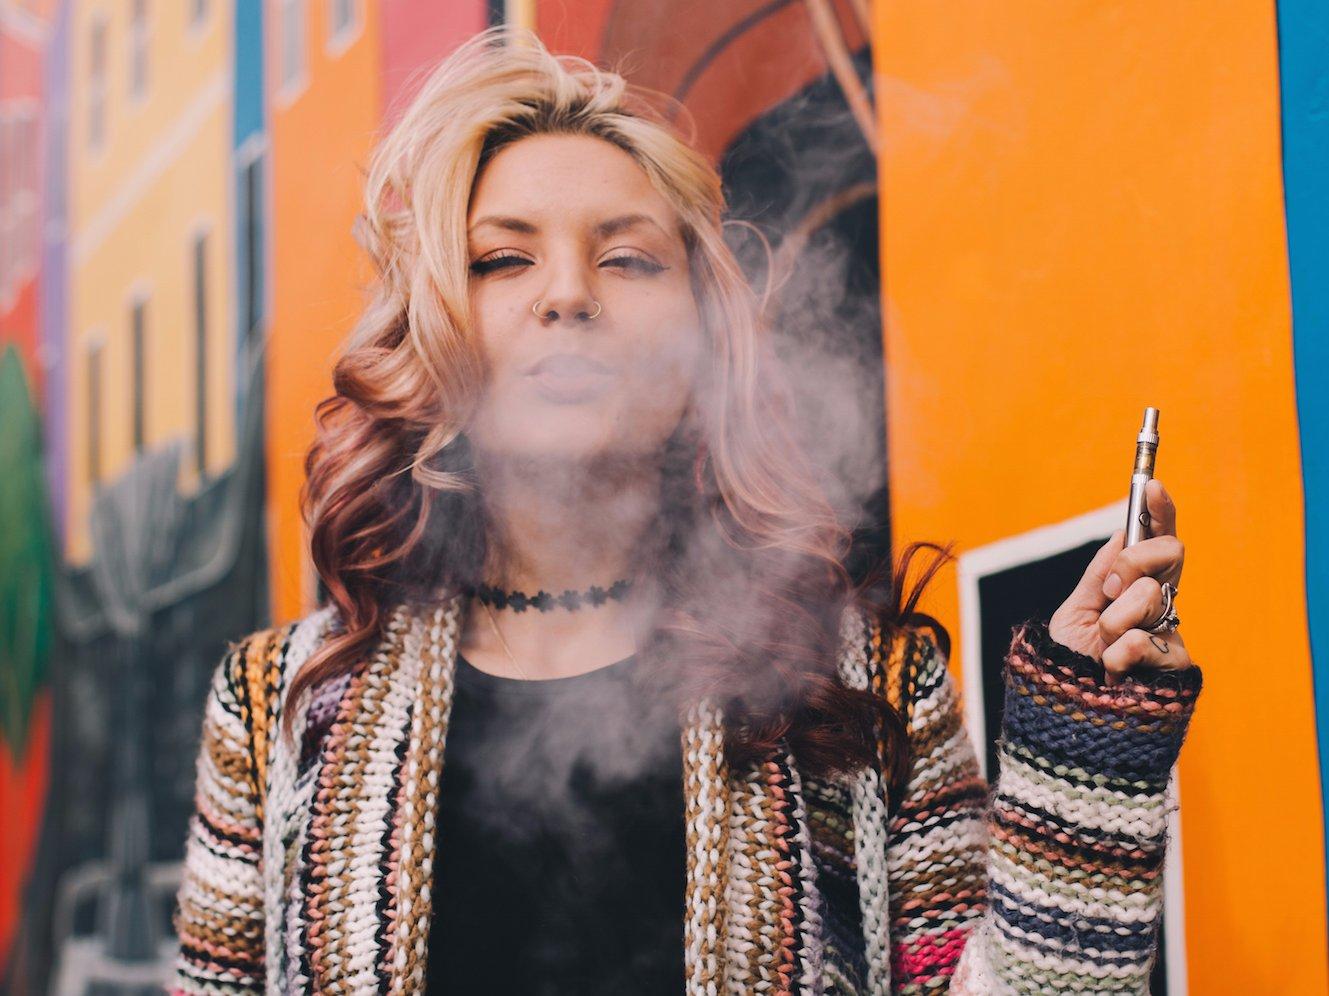 marijuana-woman-smoking-joint-2.jpg